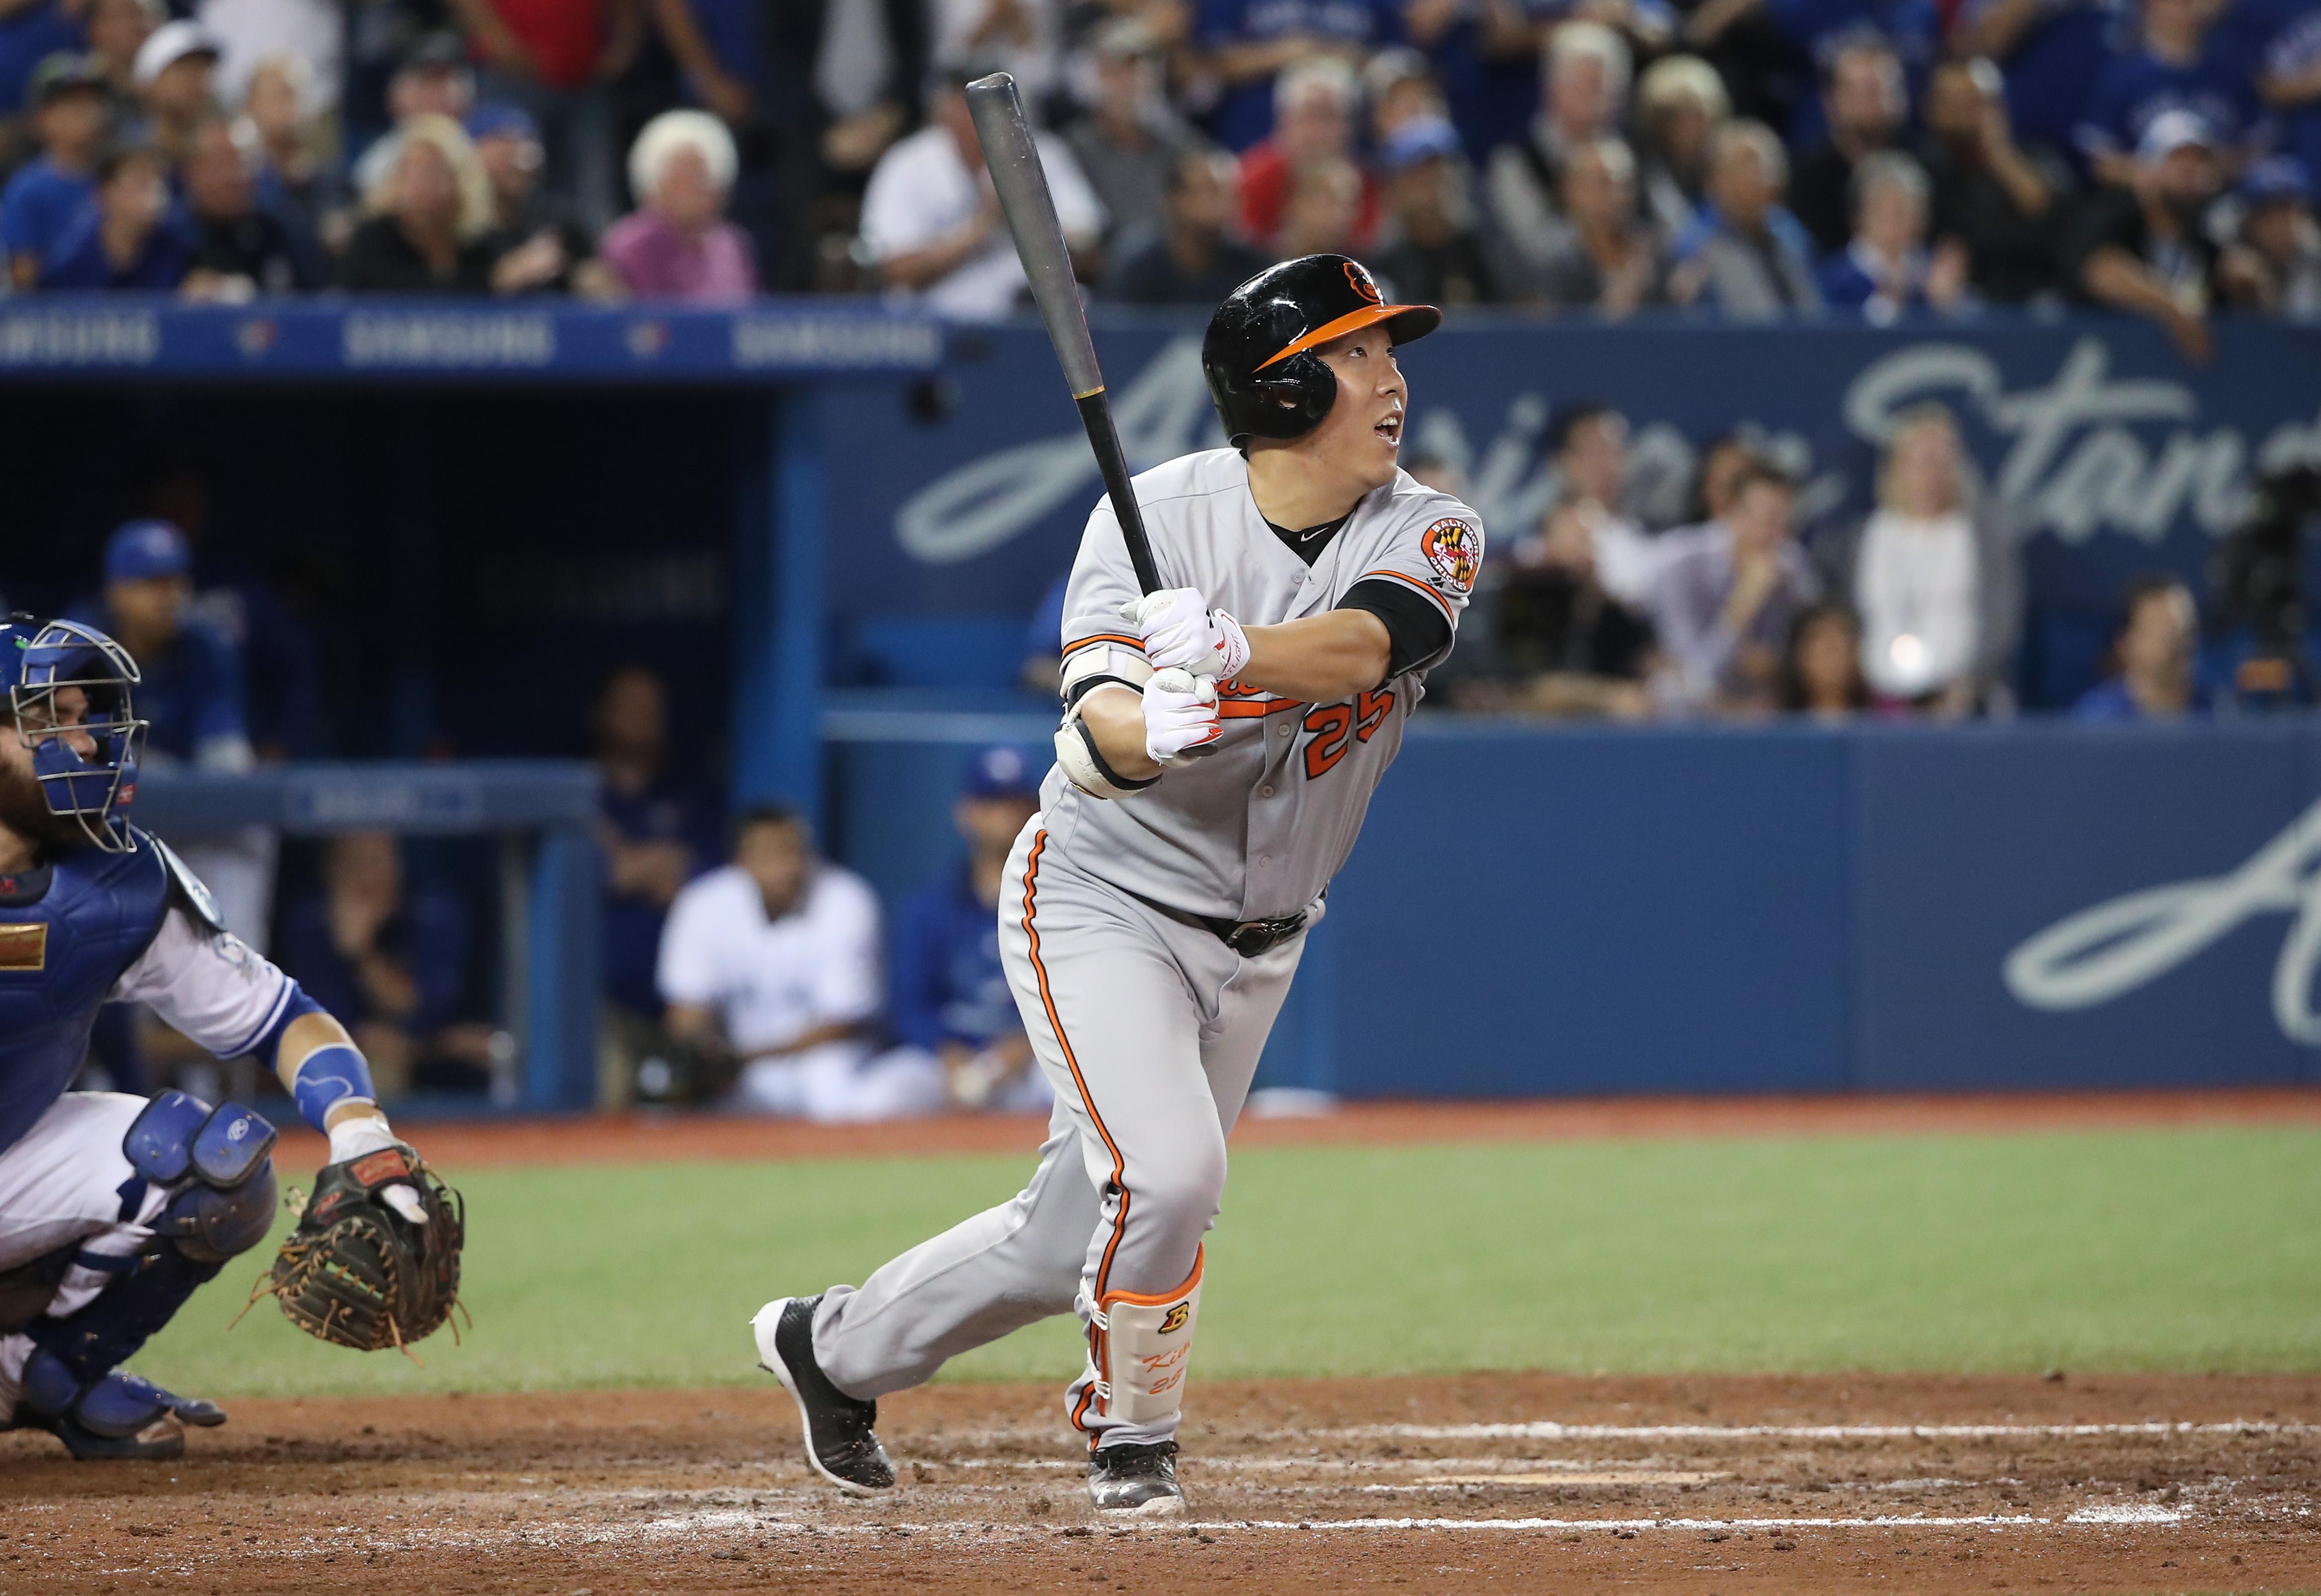 Hyun Soo Kim watches as his go-ahead home run soars towards the Orioles bullpen on Wednesday night.